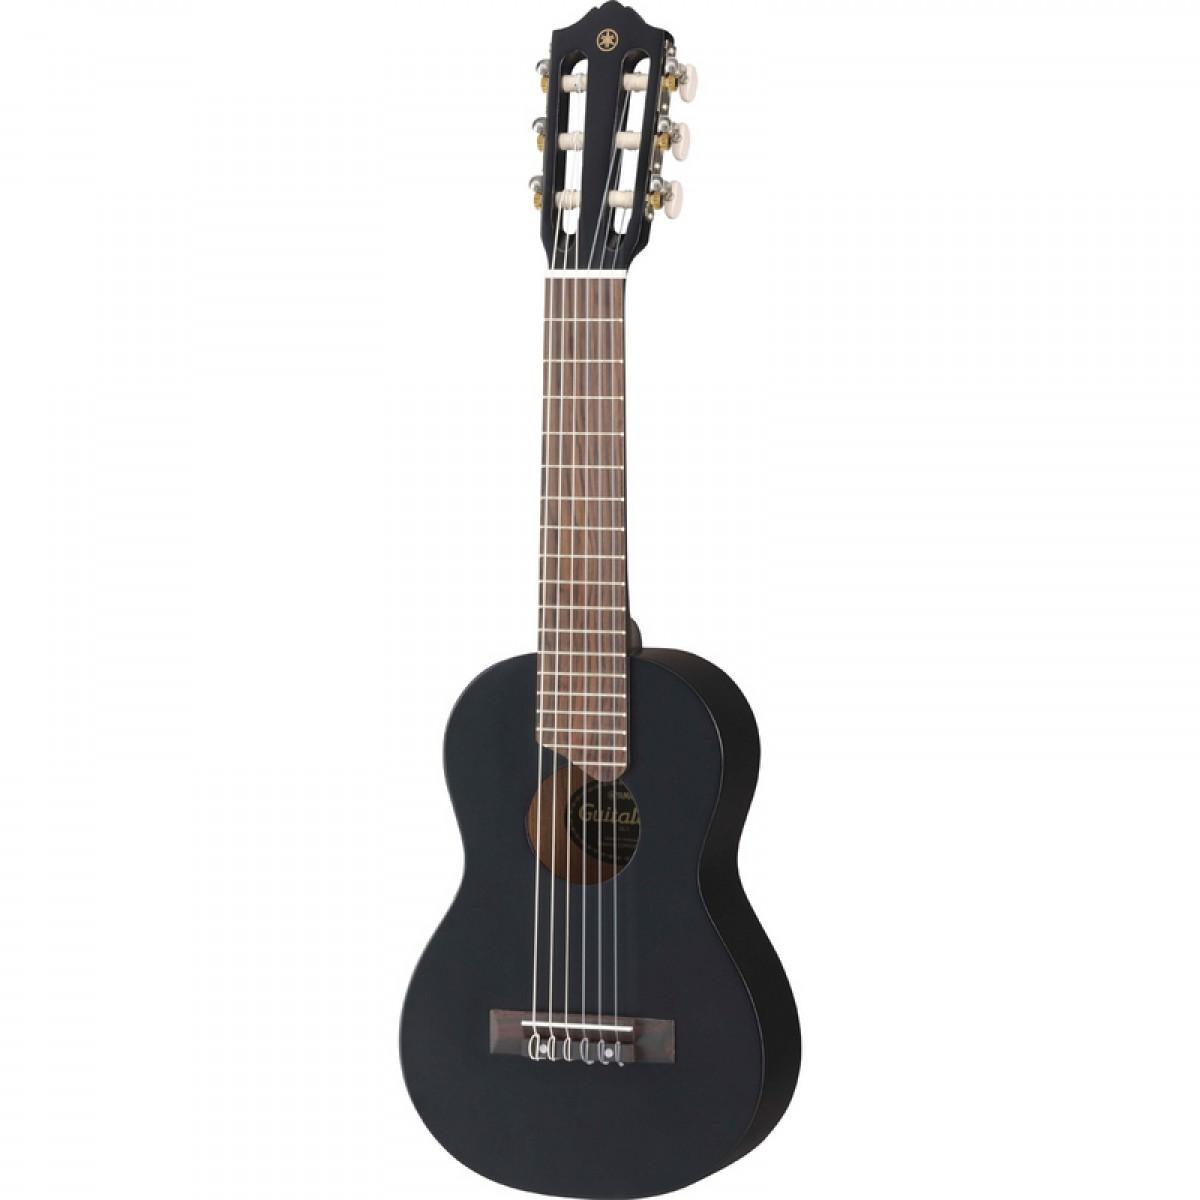 Guitarlele Yamaha, Reisegitarre